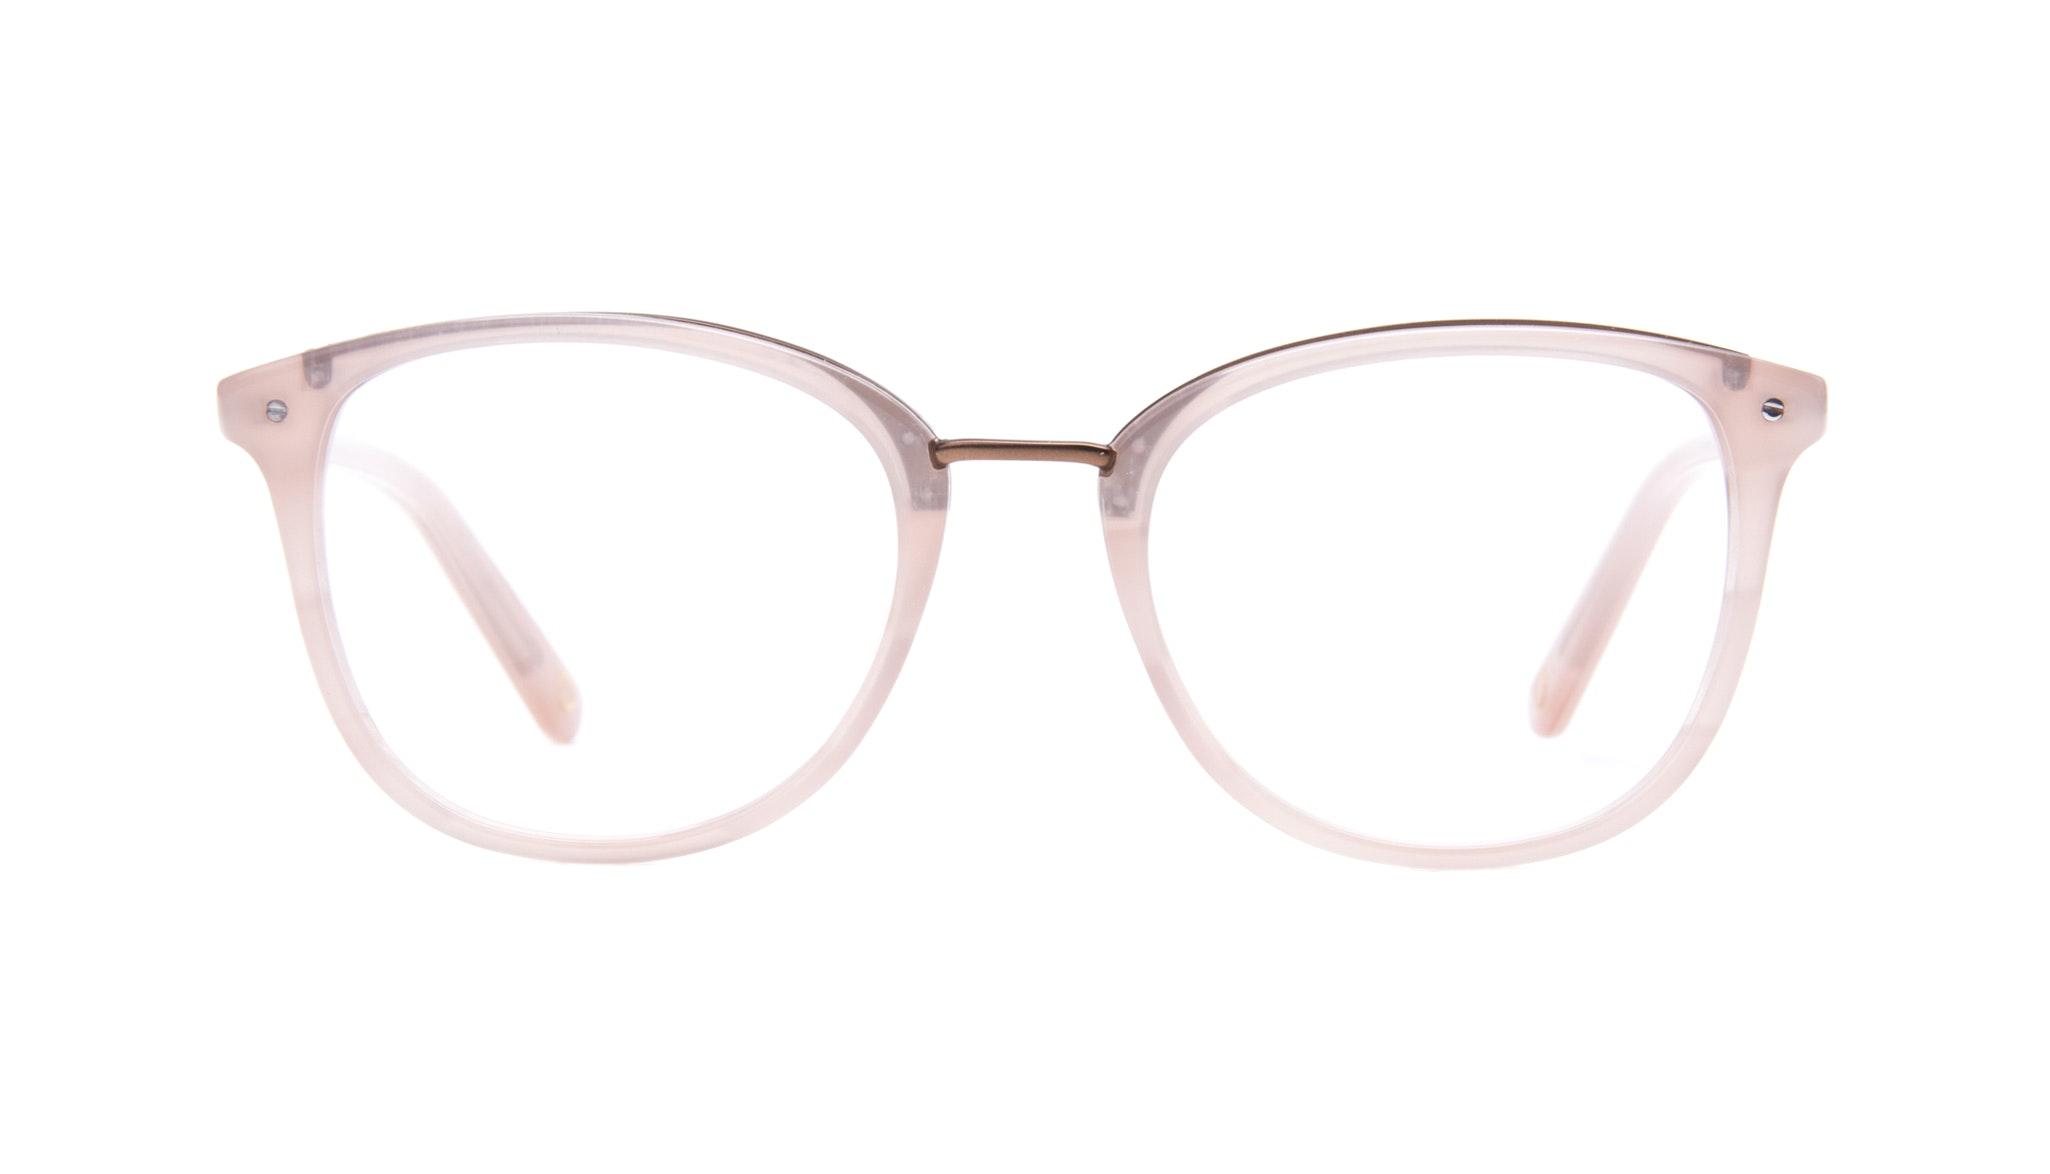 Affordable Fashion Glasses Square Round Eyeglasses Women Ella Blush Front